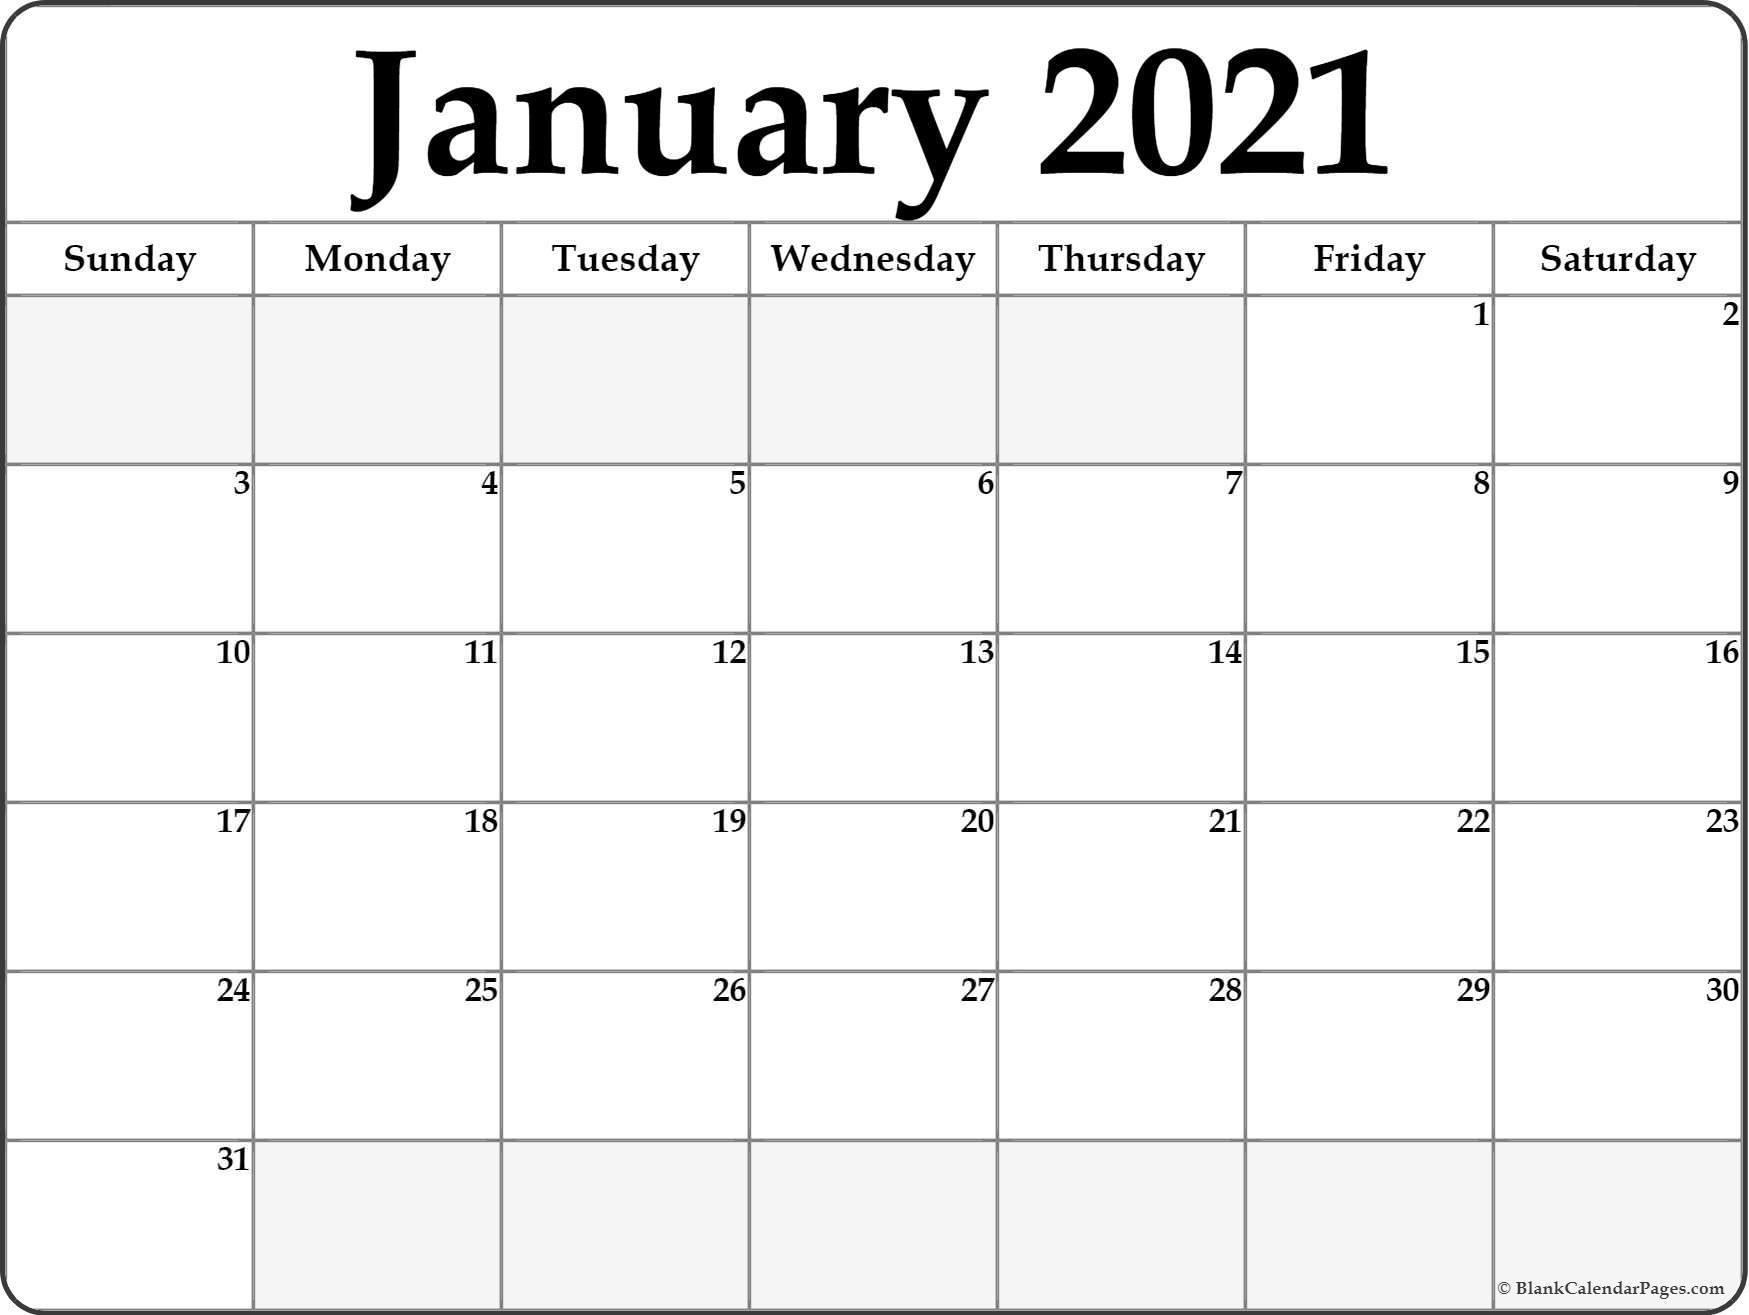 January 2021 Blank Calendar Collection 7